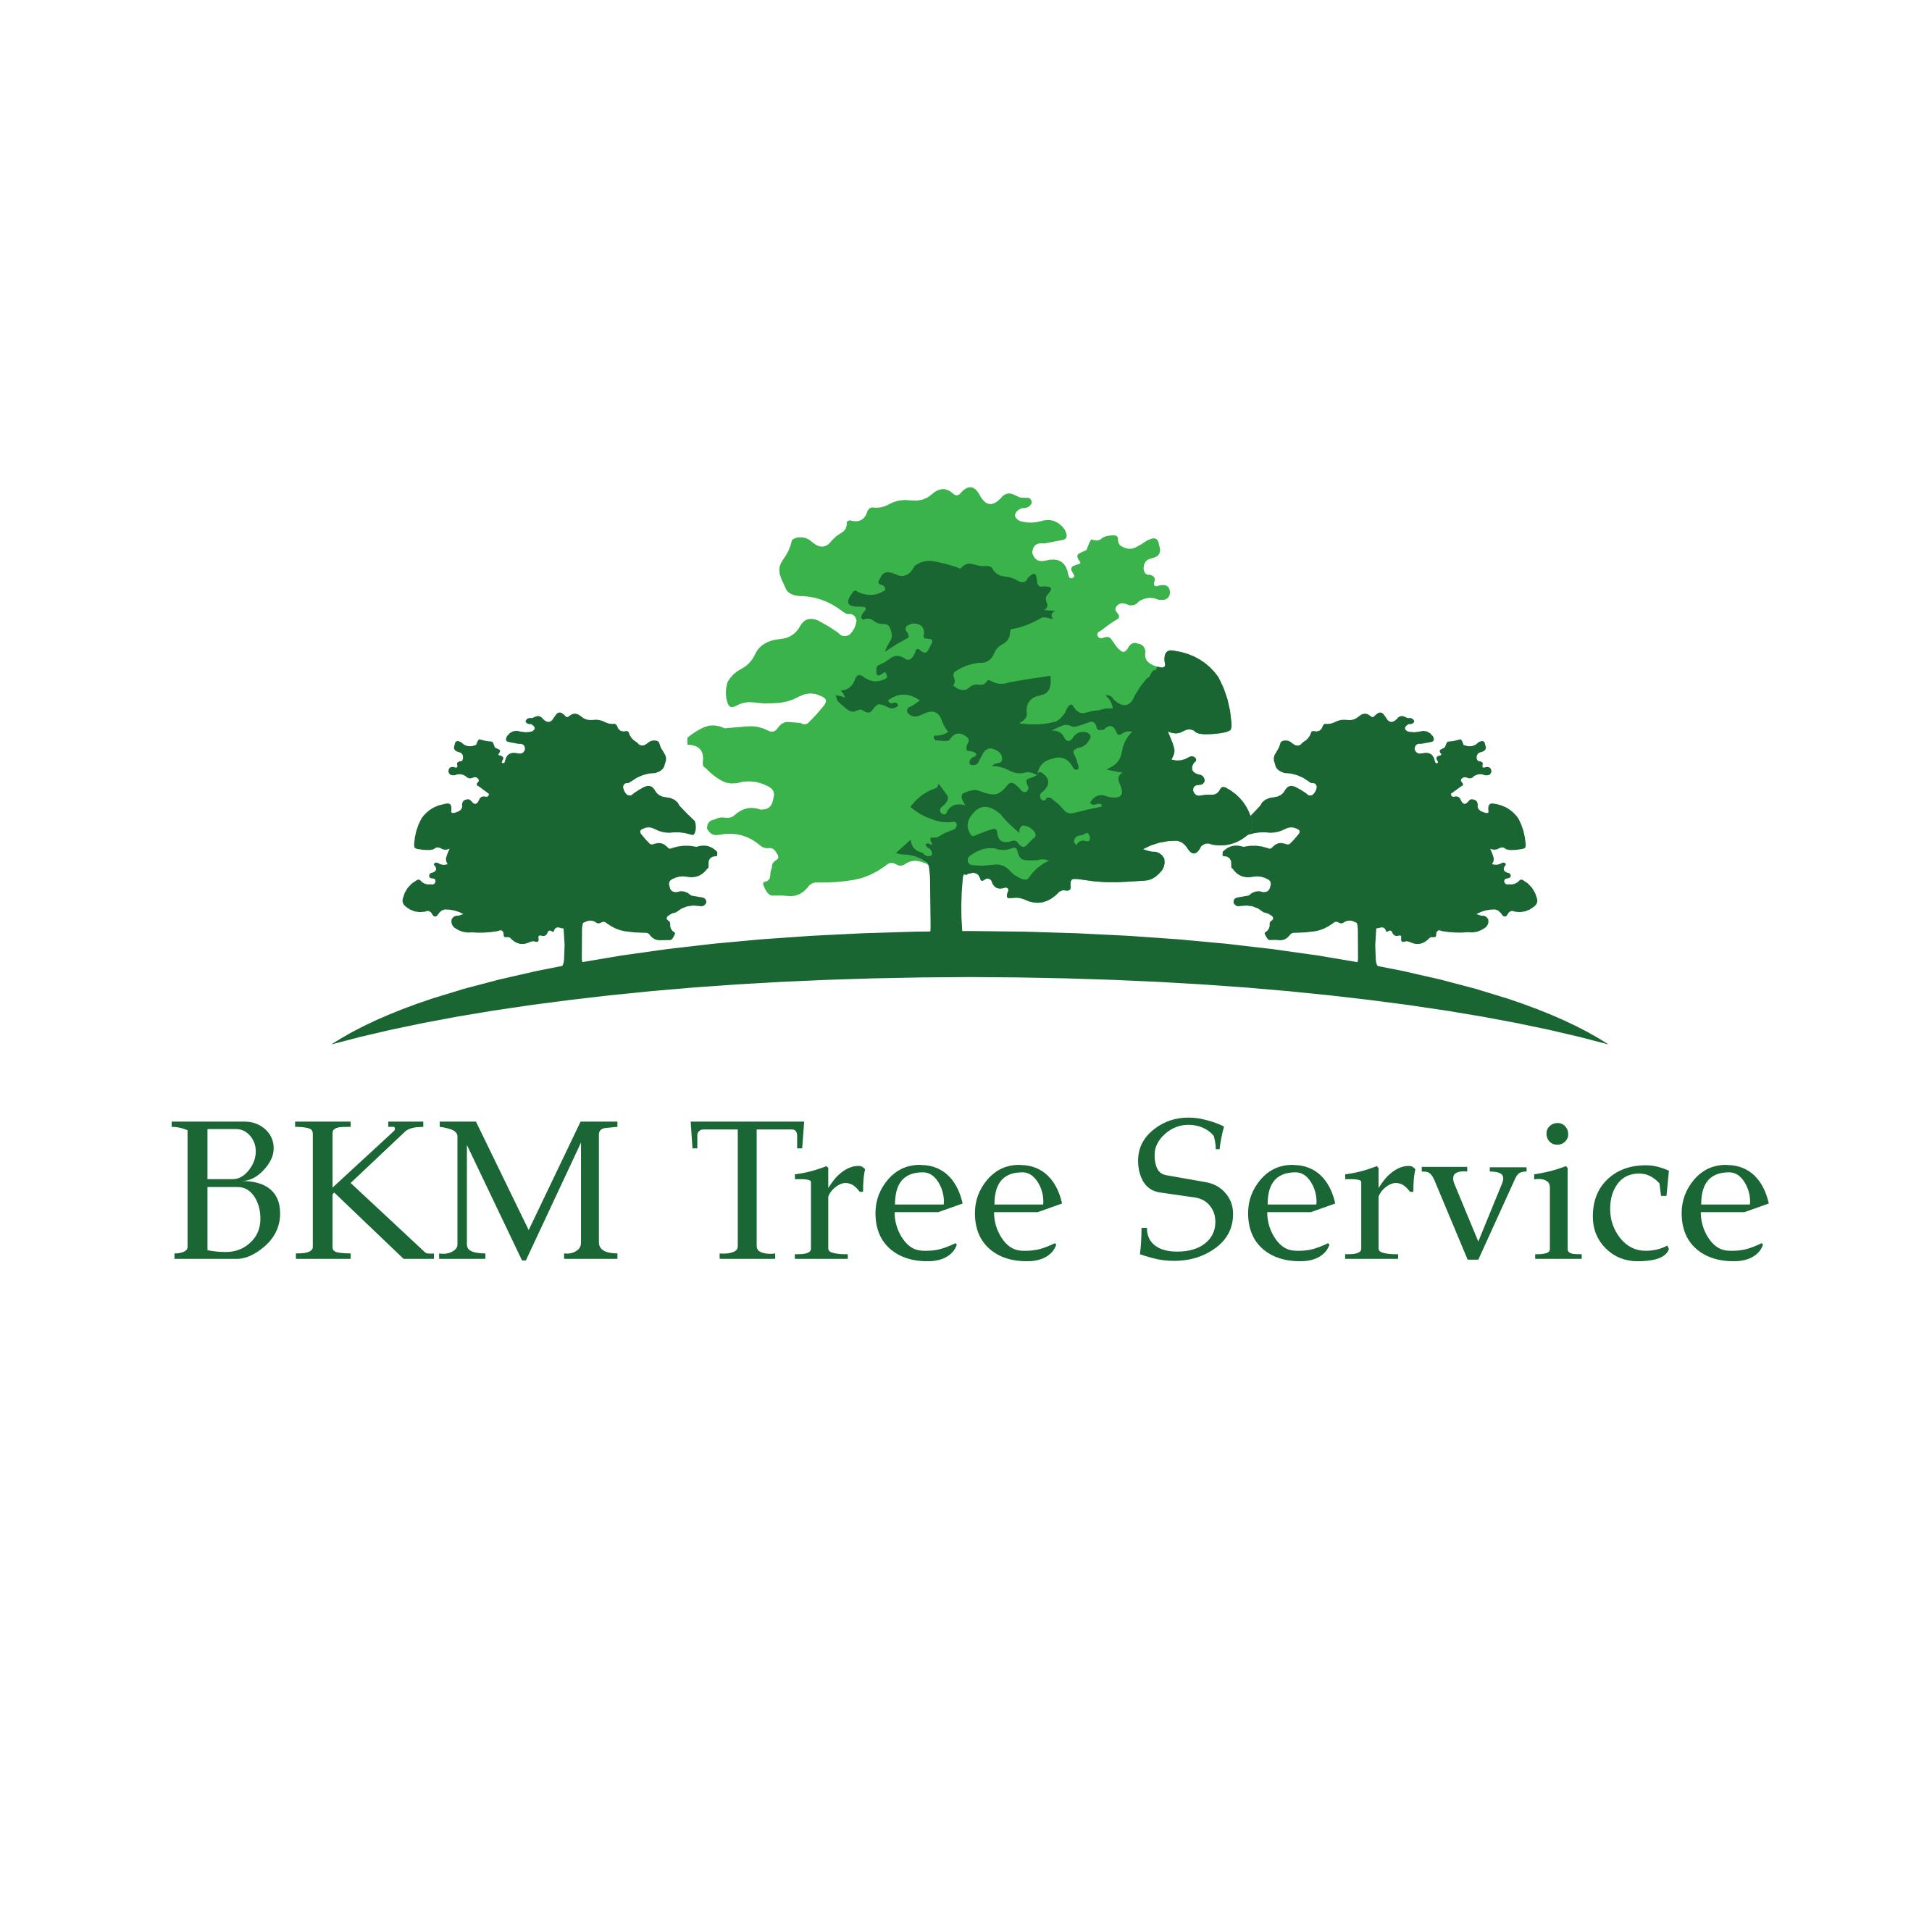 BKM Tree Service